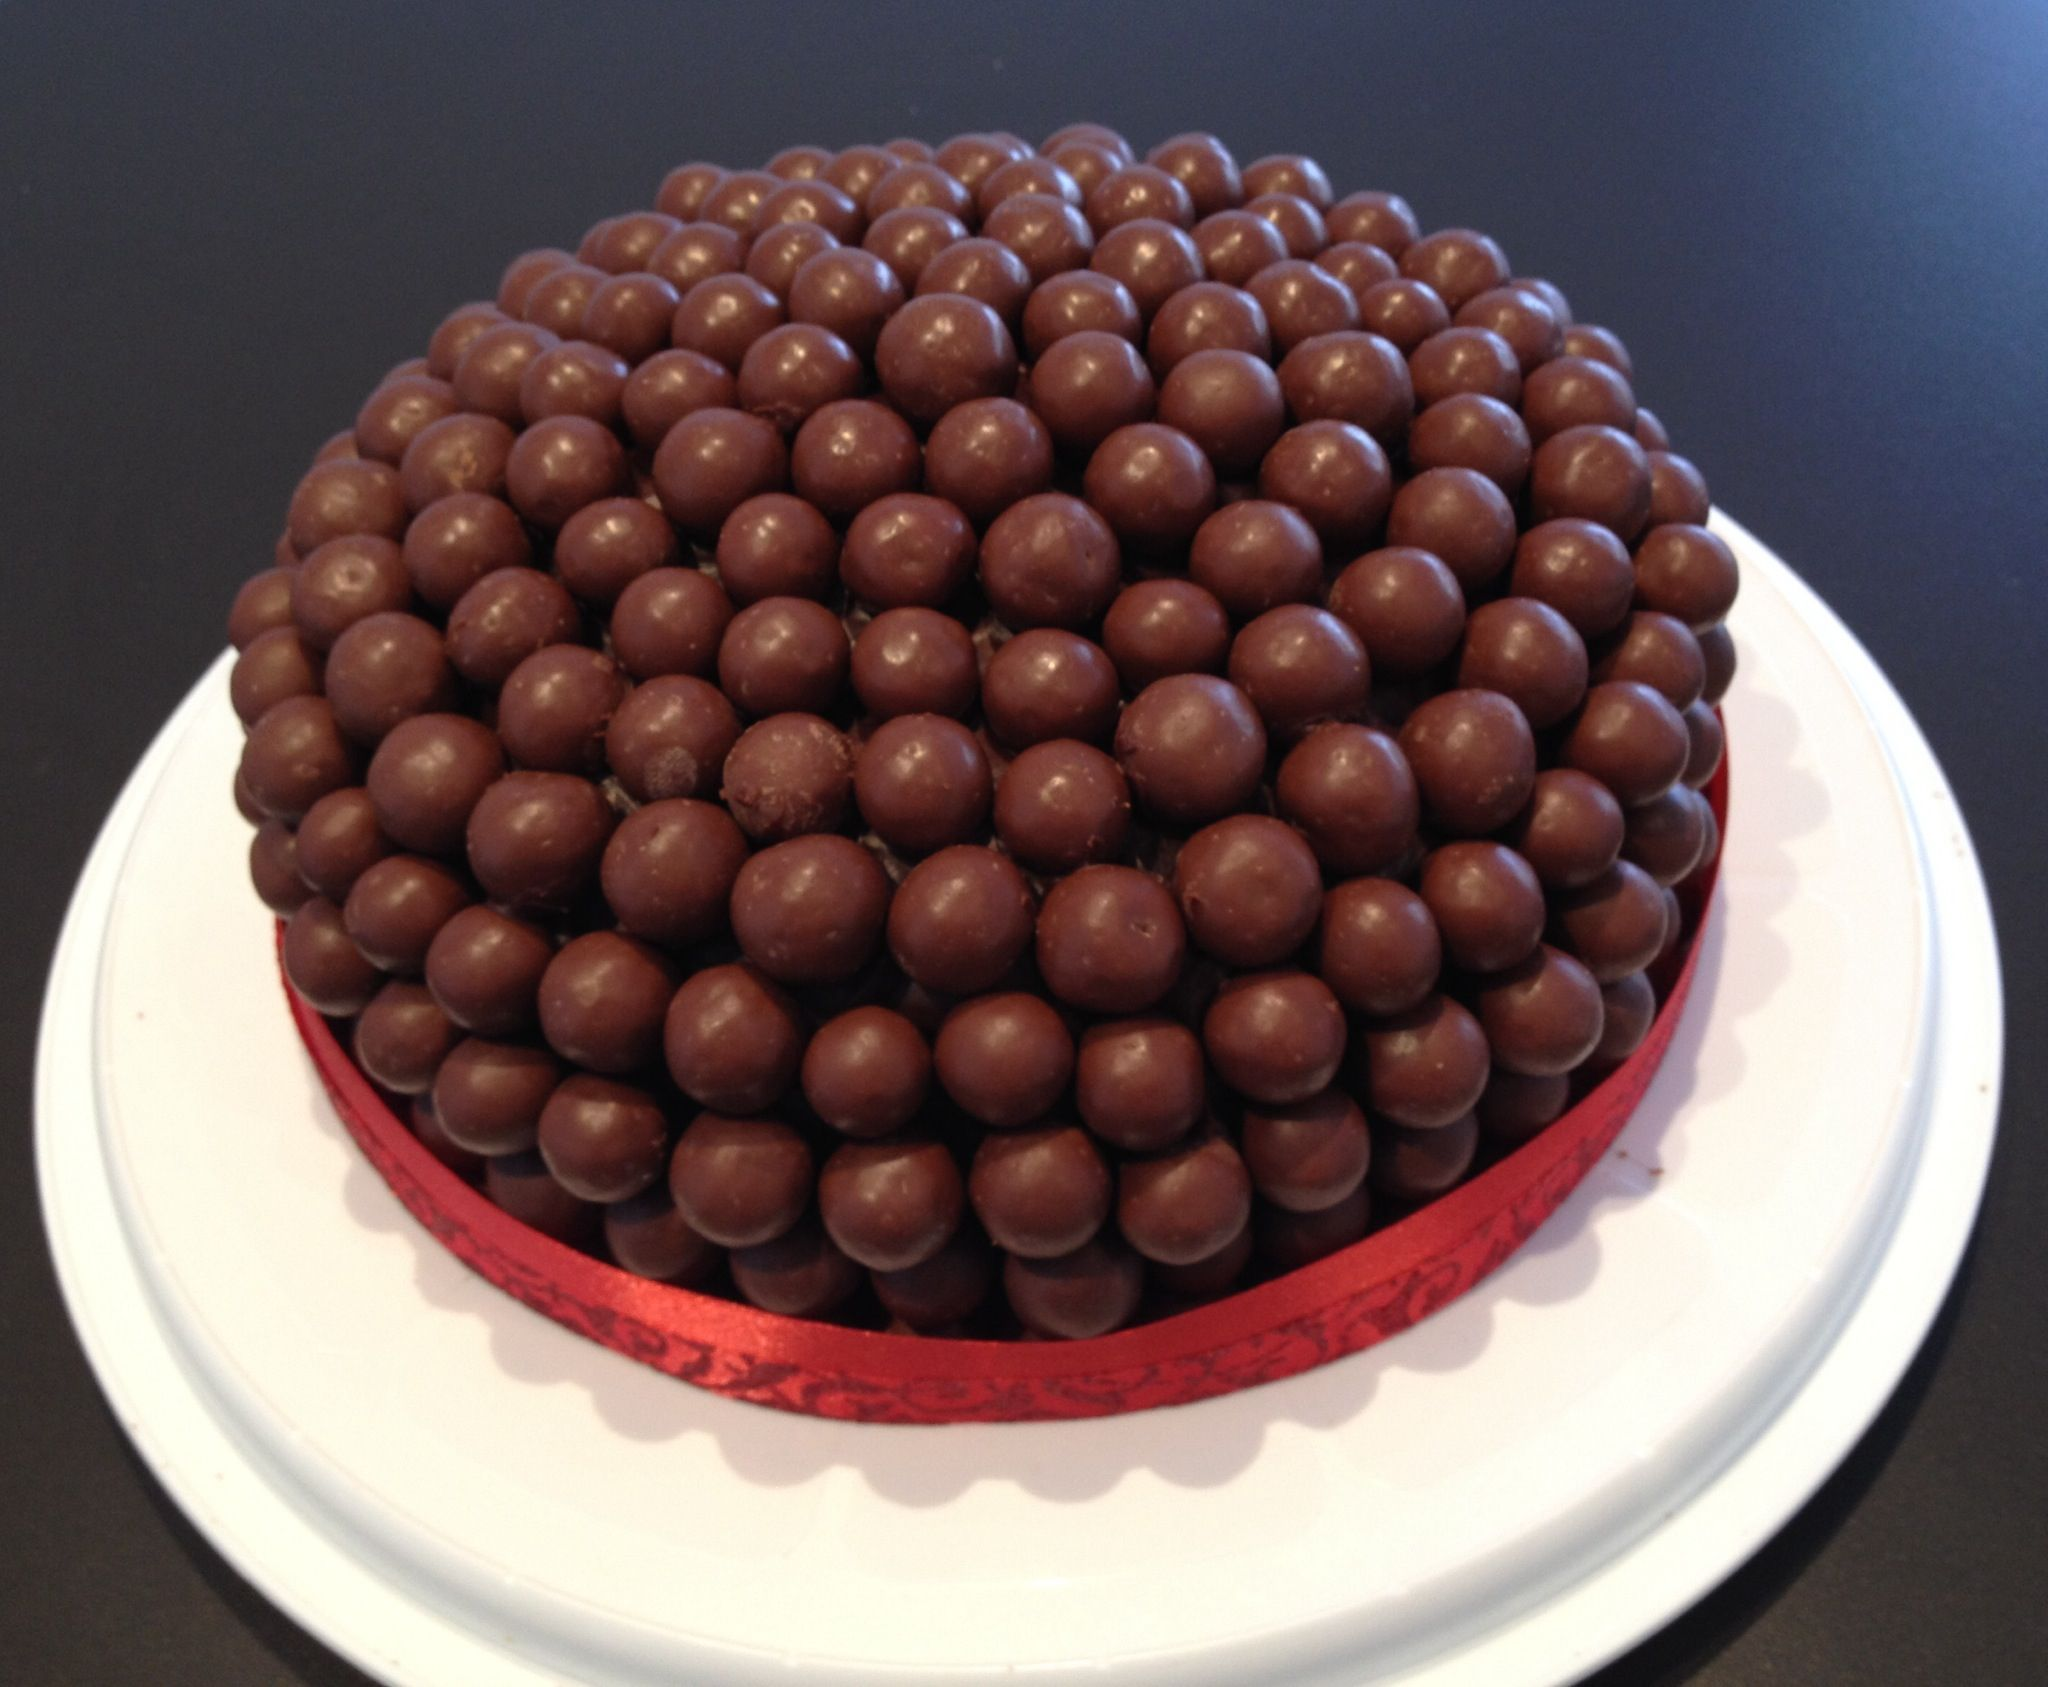 Maltesers Chocolate Cake & Malt Filling, Covered in Dark Chocolate ...